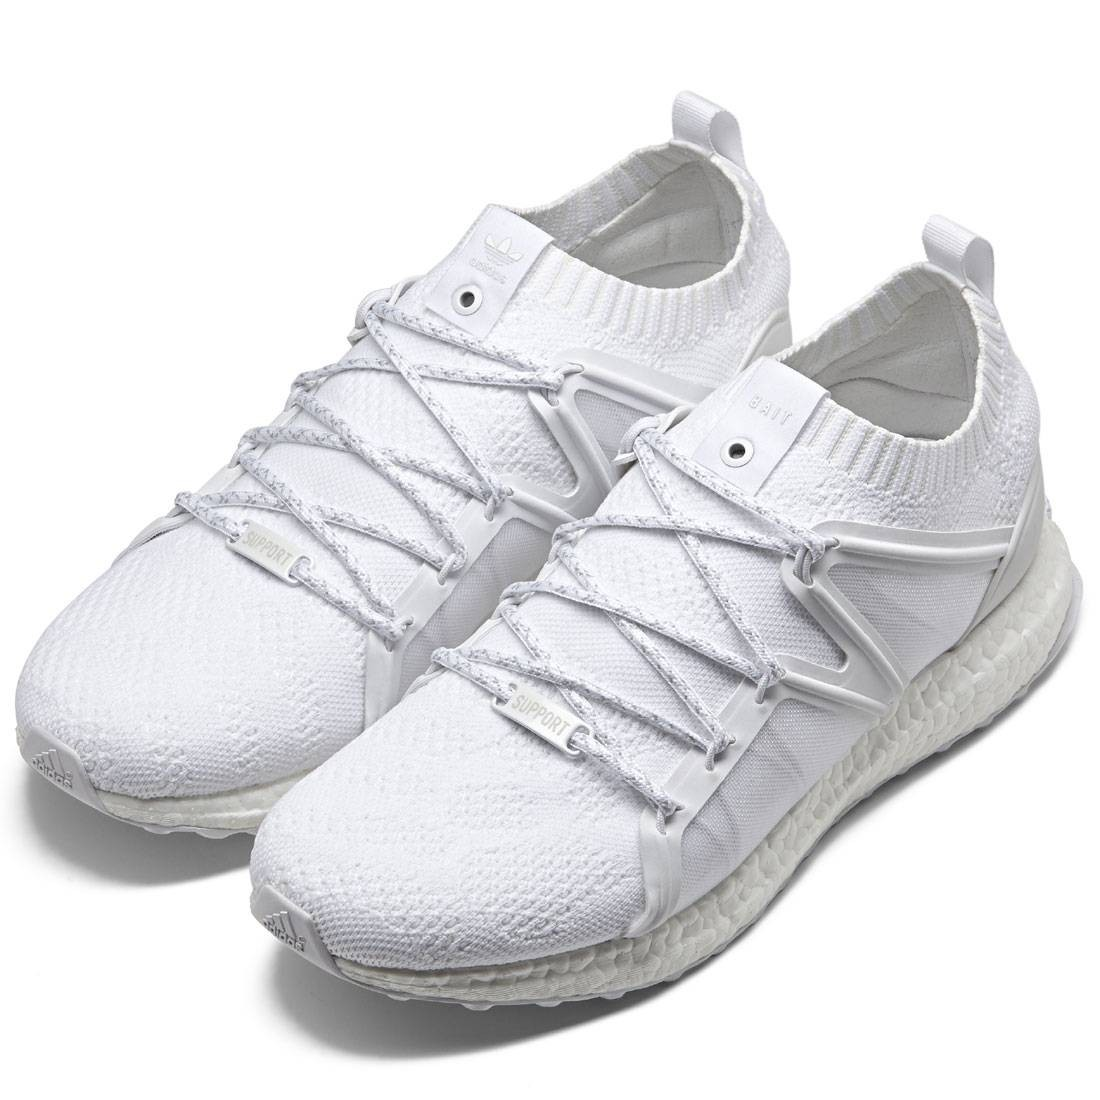 watch 71bcb f0228 BAIT x Adidas Consortium EQT Support 93/16 R&D US Men Size 5